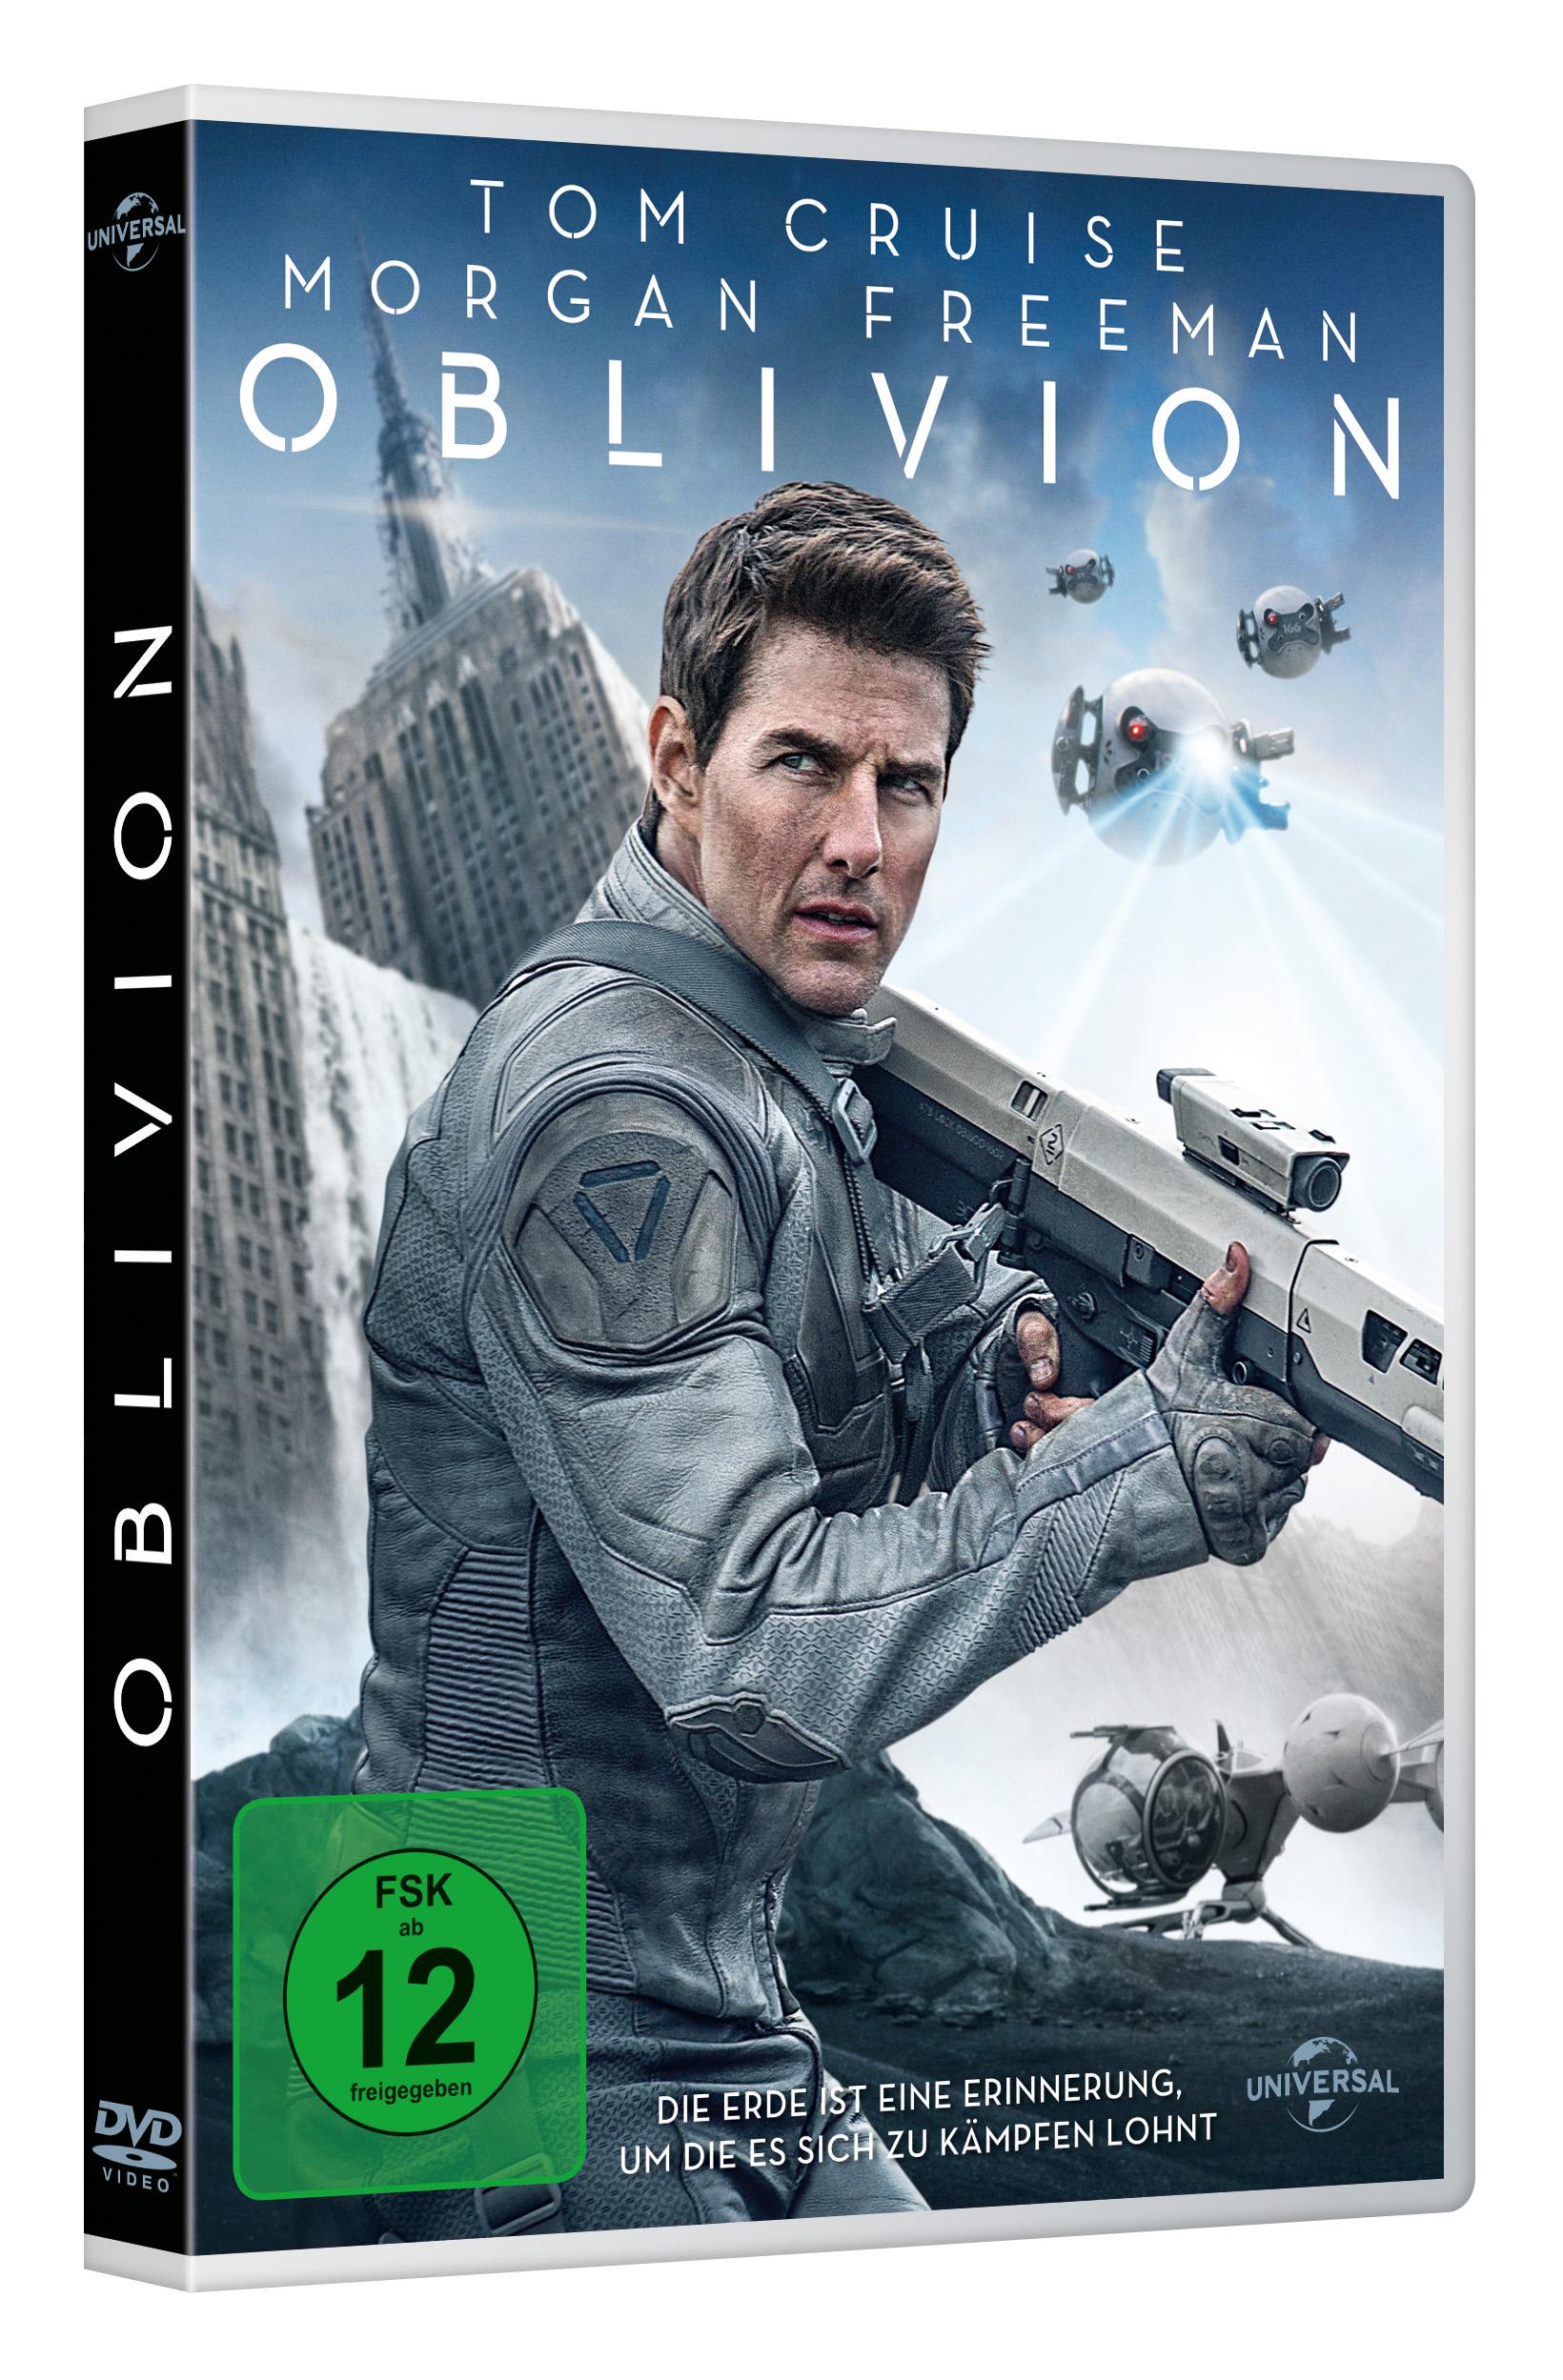 Filmkritik Oblivion Dvd